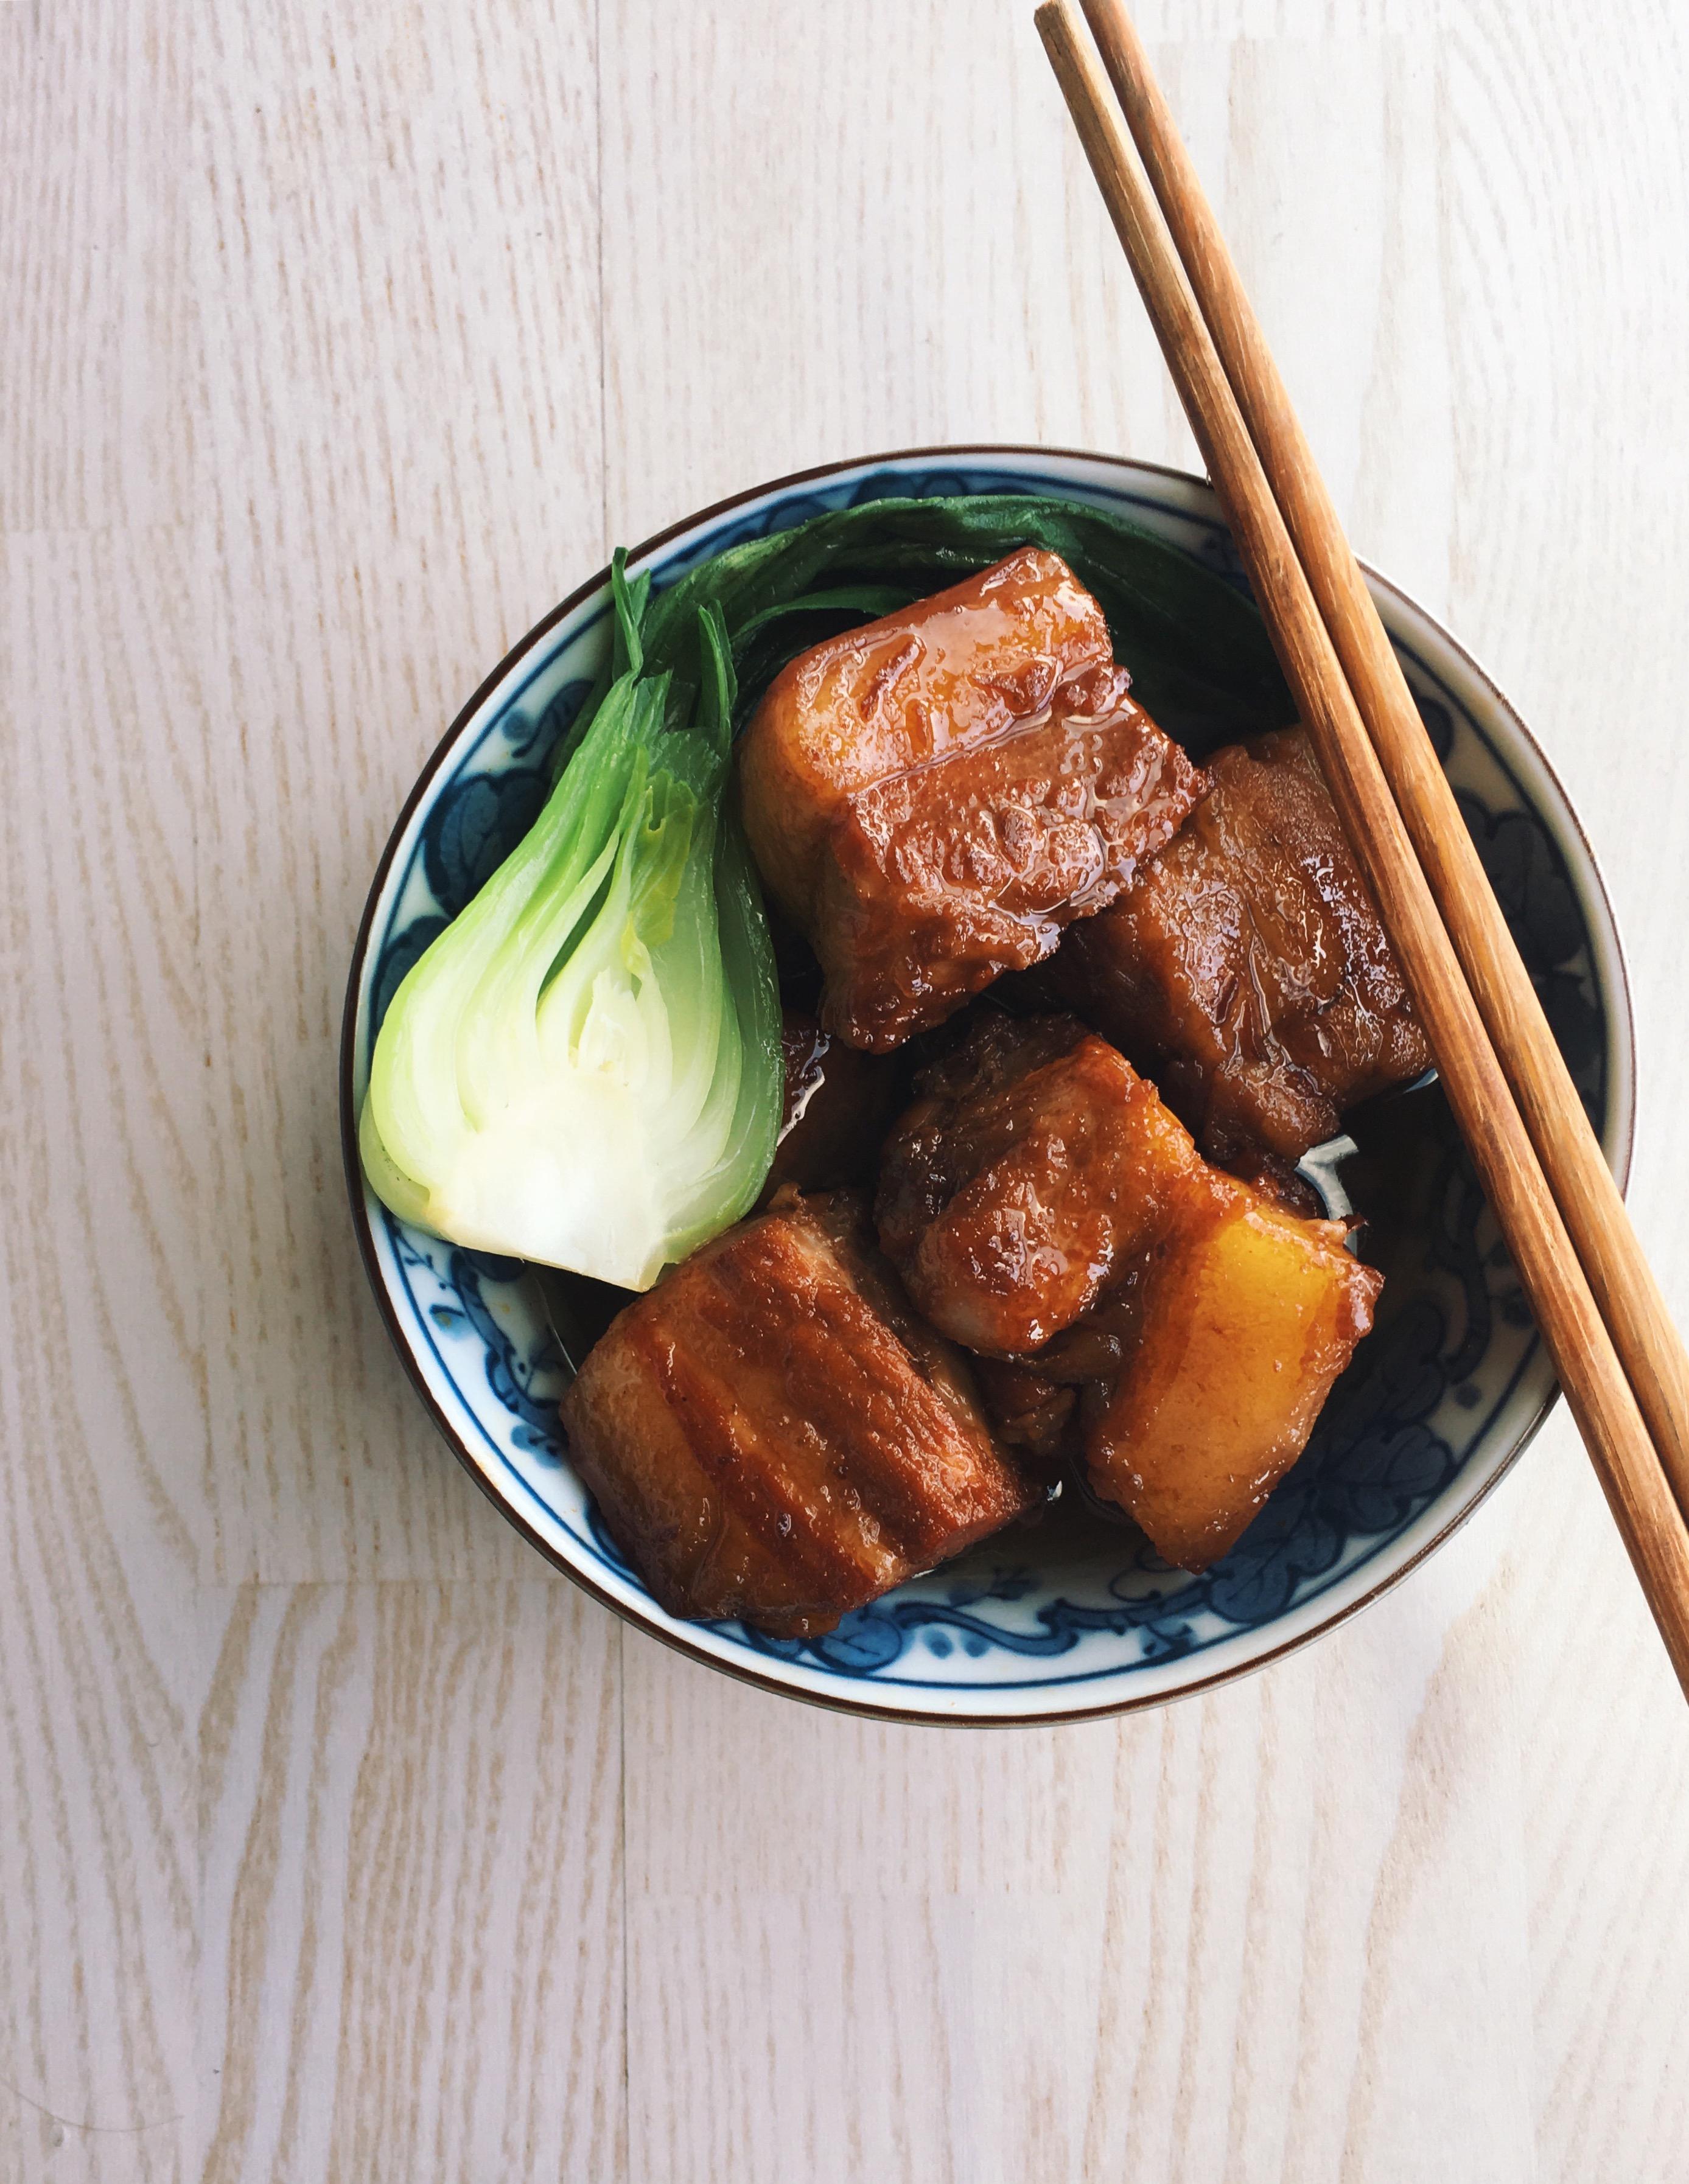 Japanese Braised Pork Belly (Buta No Kakuni) | Not Another Food Blog